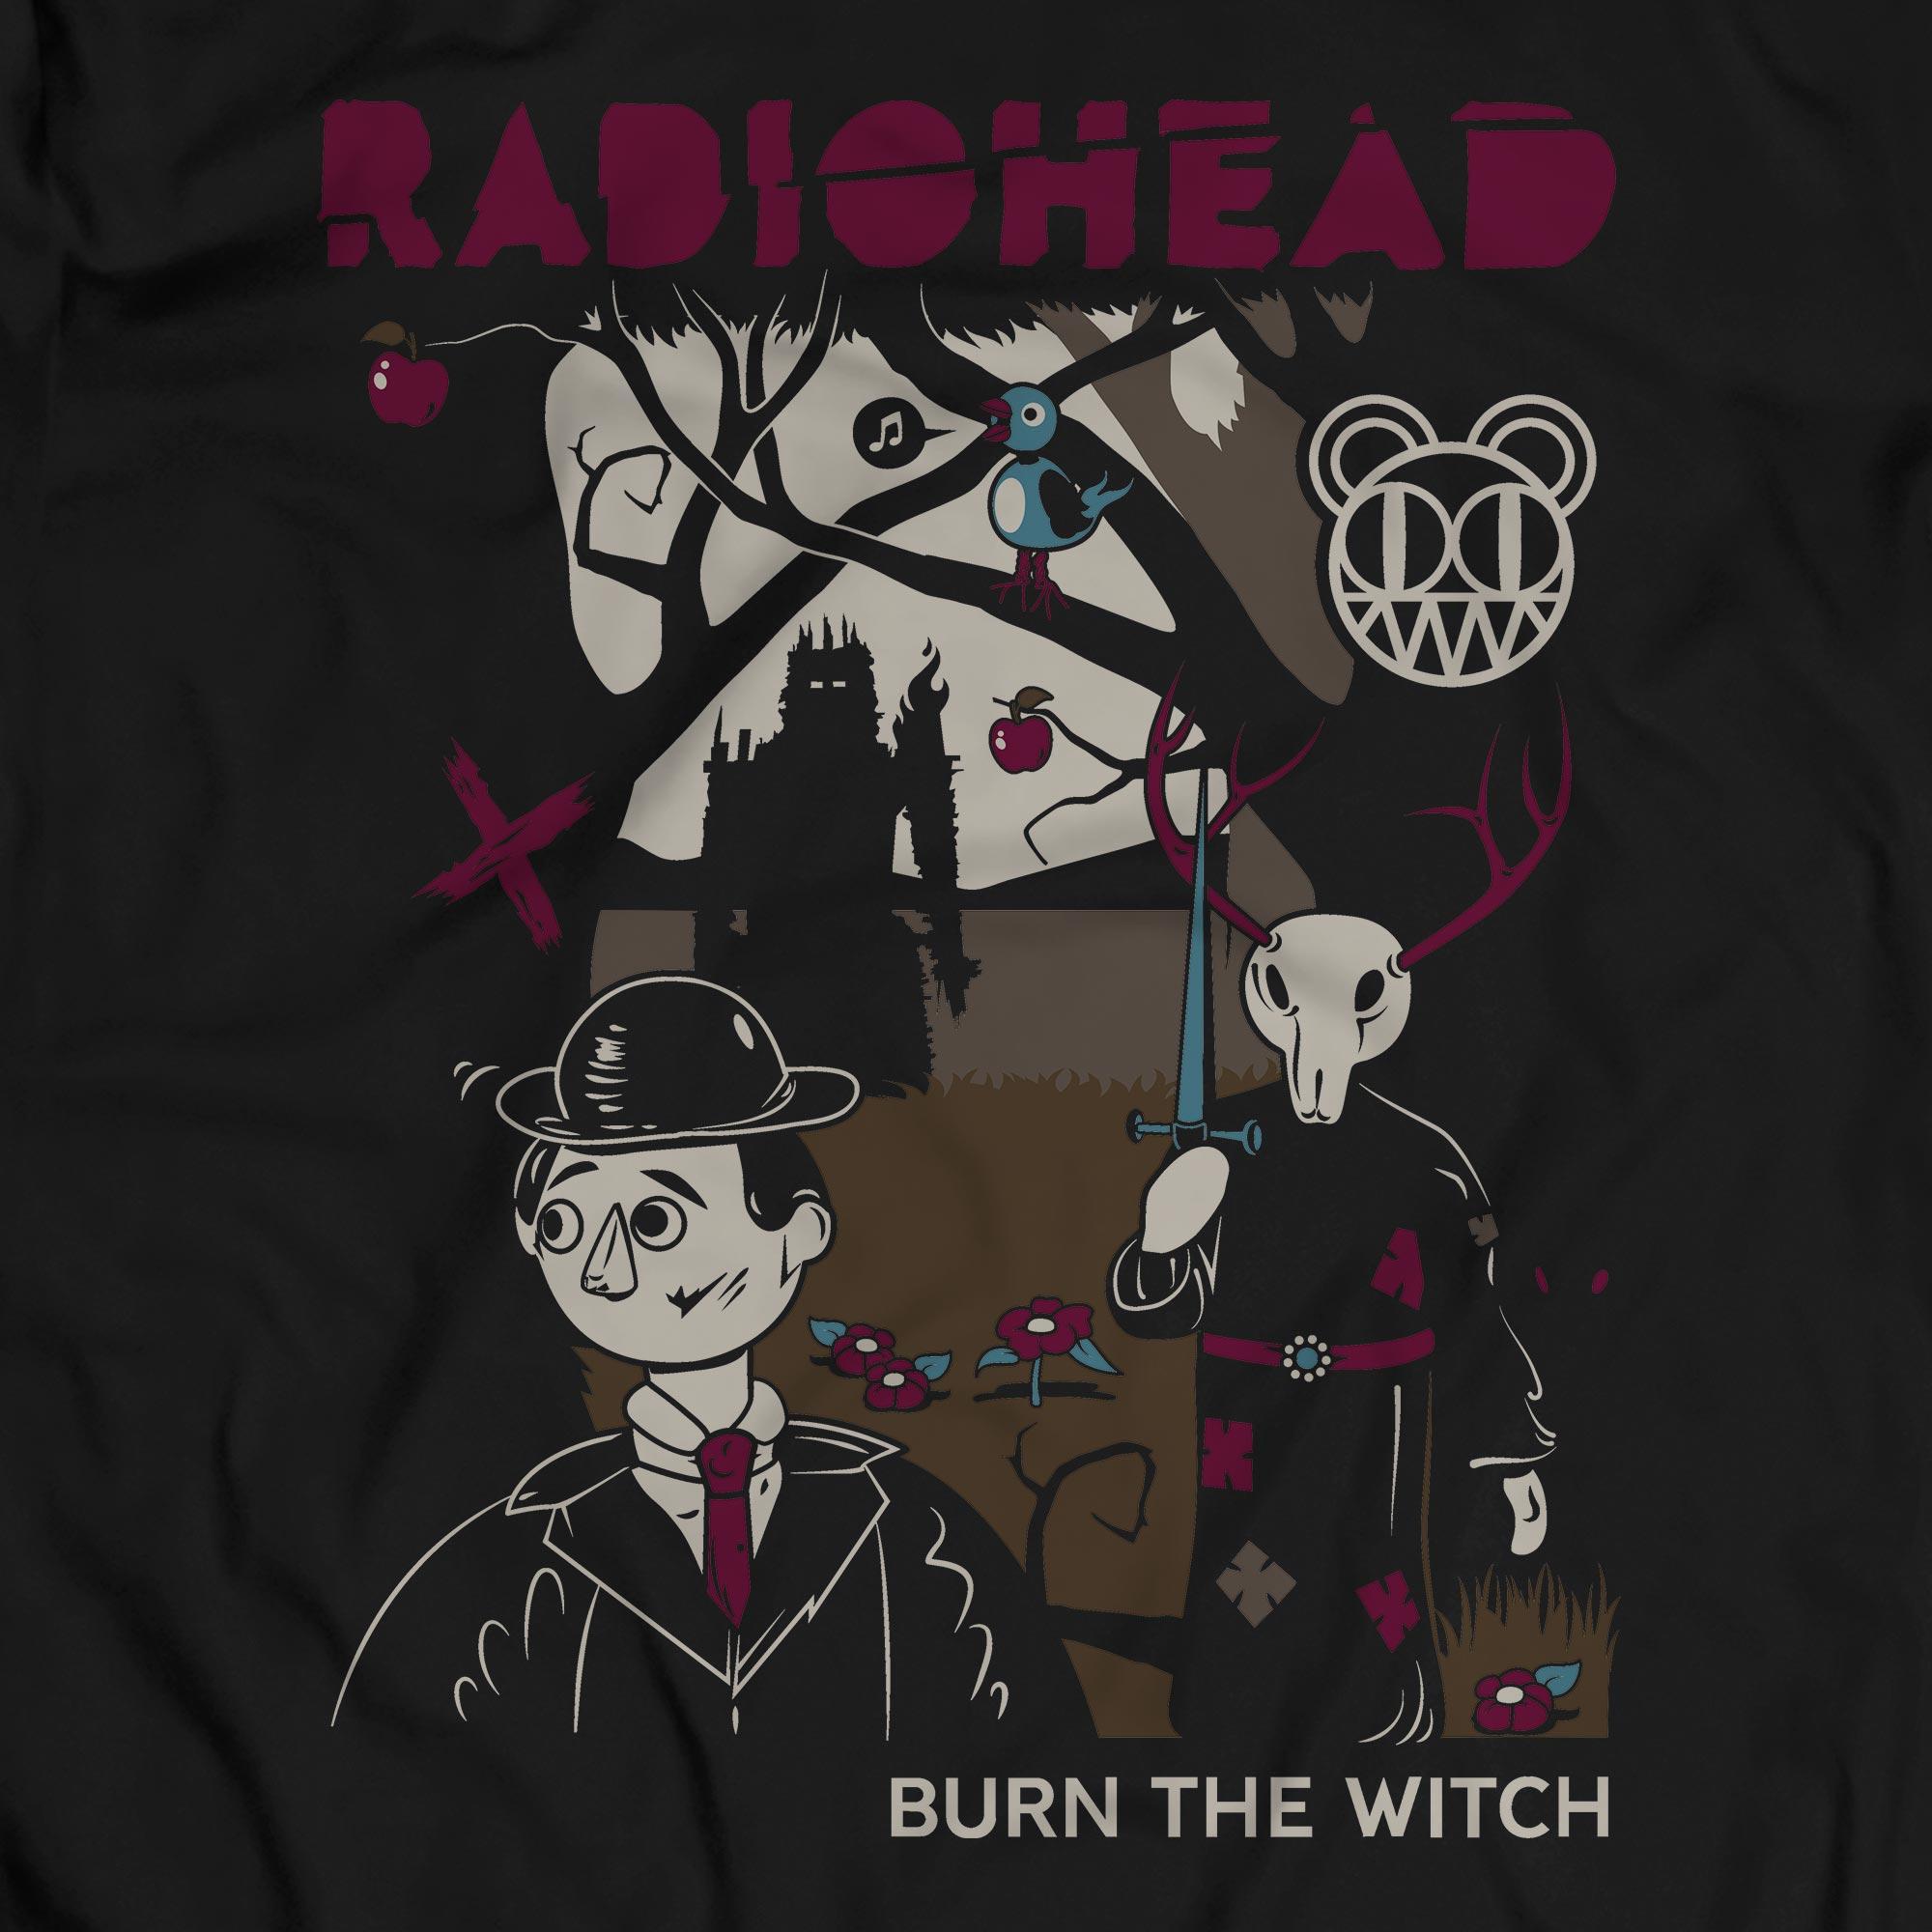 Camiseta Burn The Witch - Radiohead - Masculino